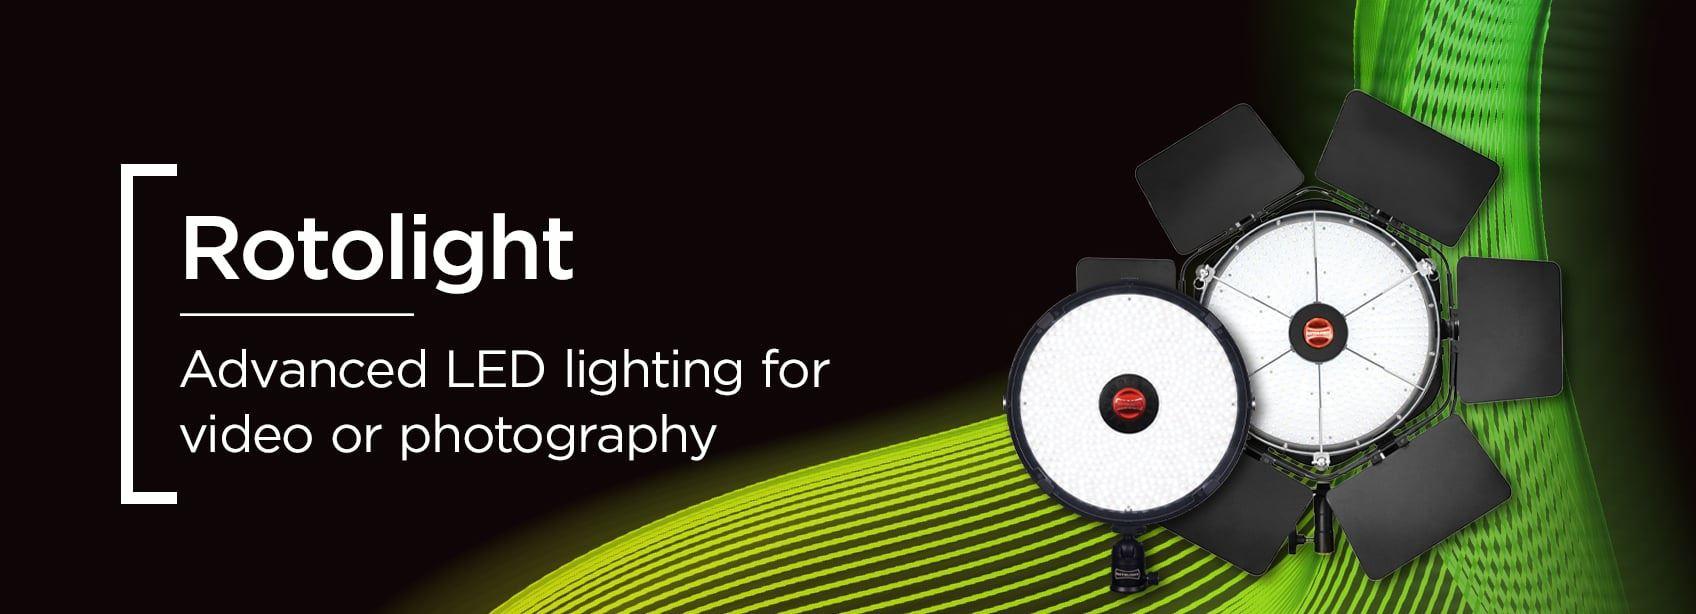 LED Lighting | Lighting and Studio | Wex Photo Video